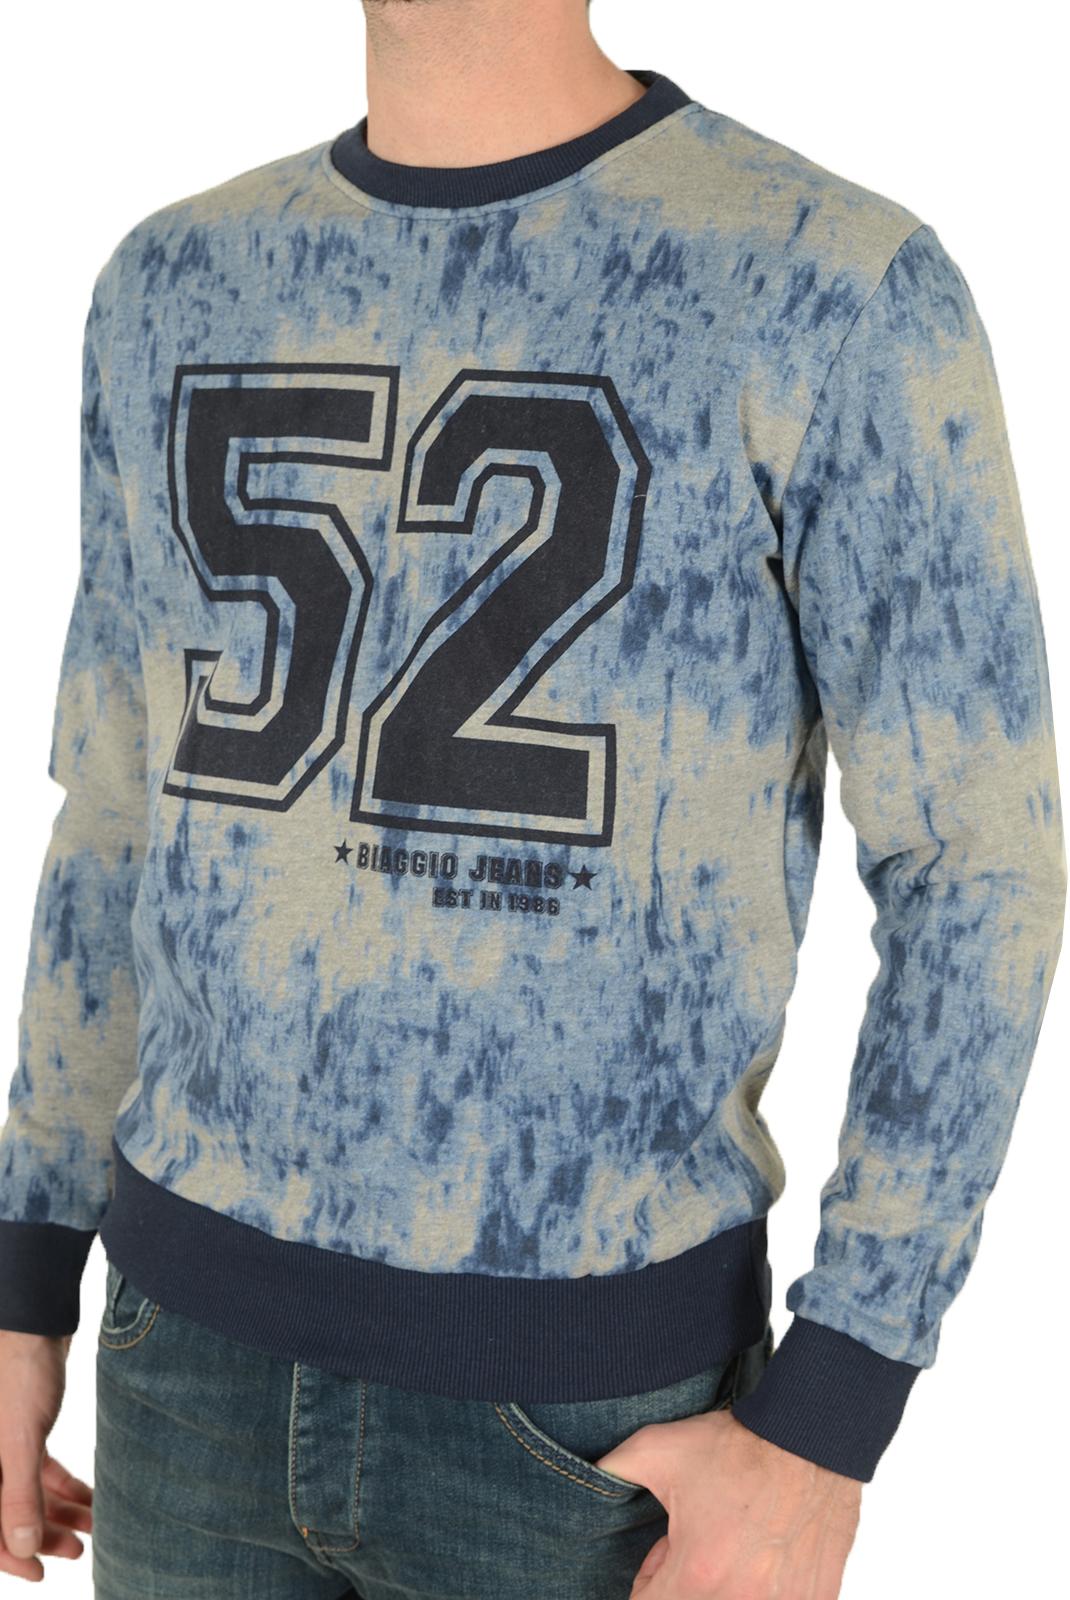 Sweatshirts  Biaggio jeans SIRKAS NAVY